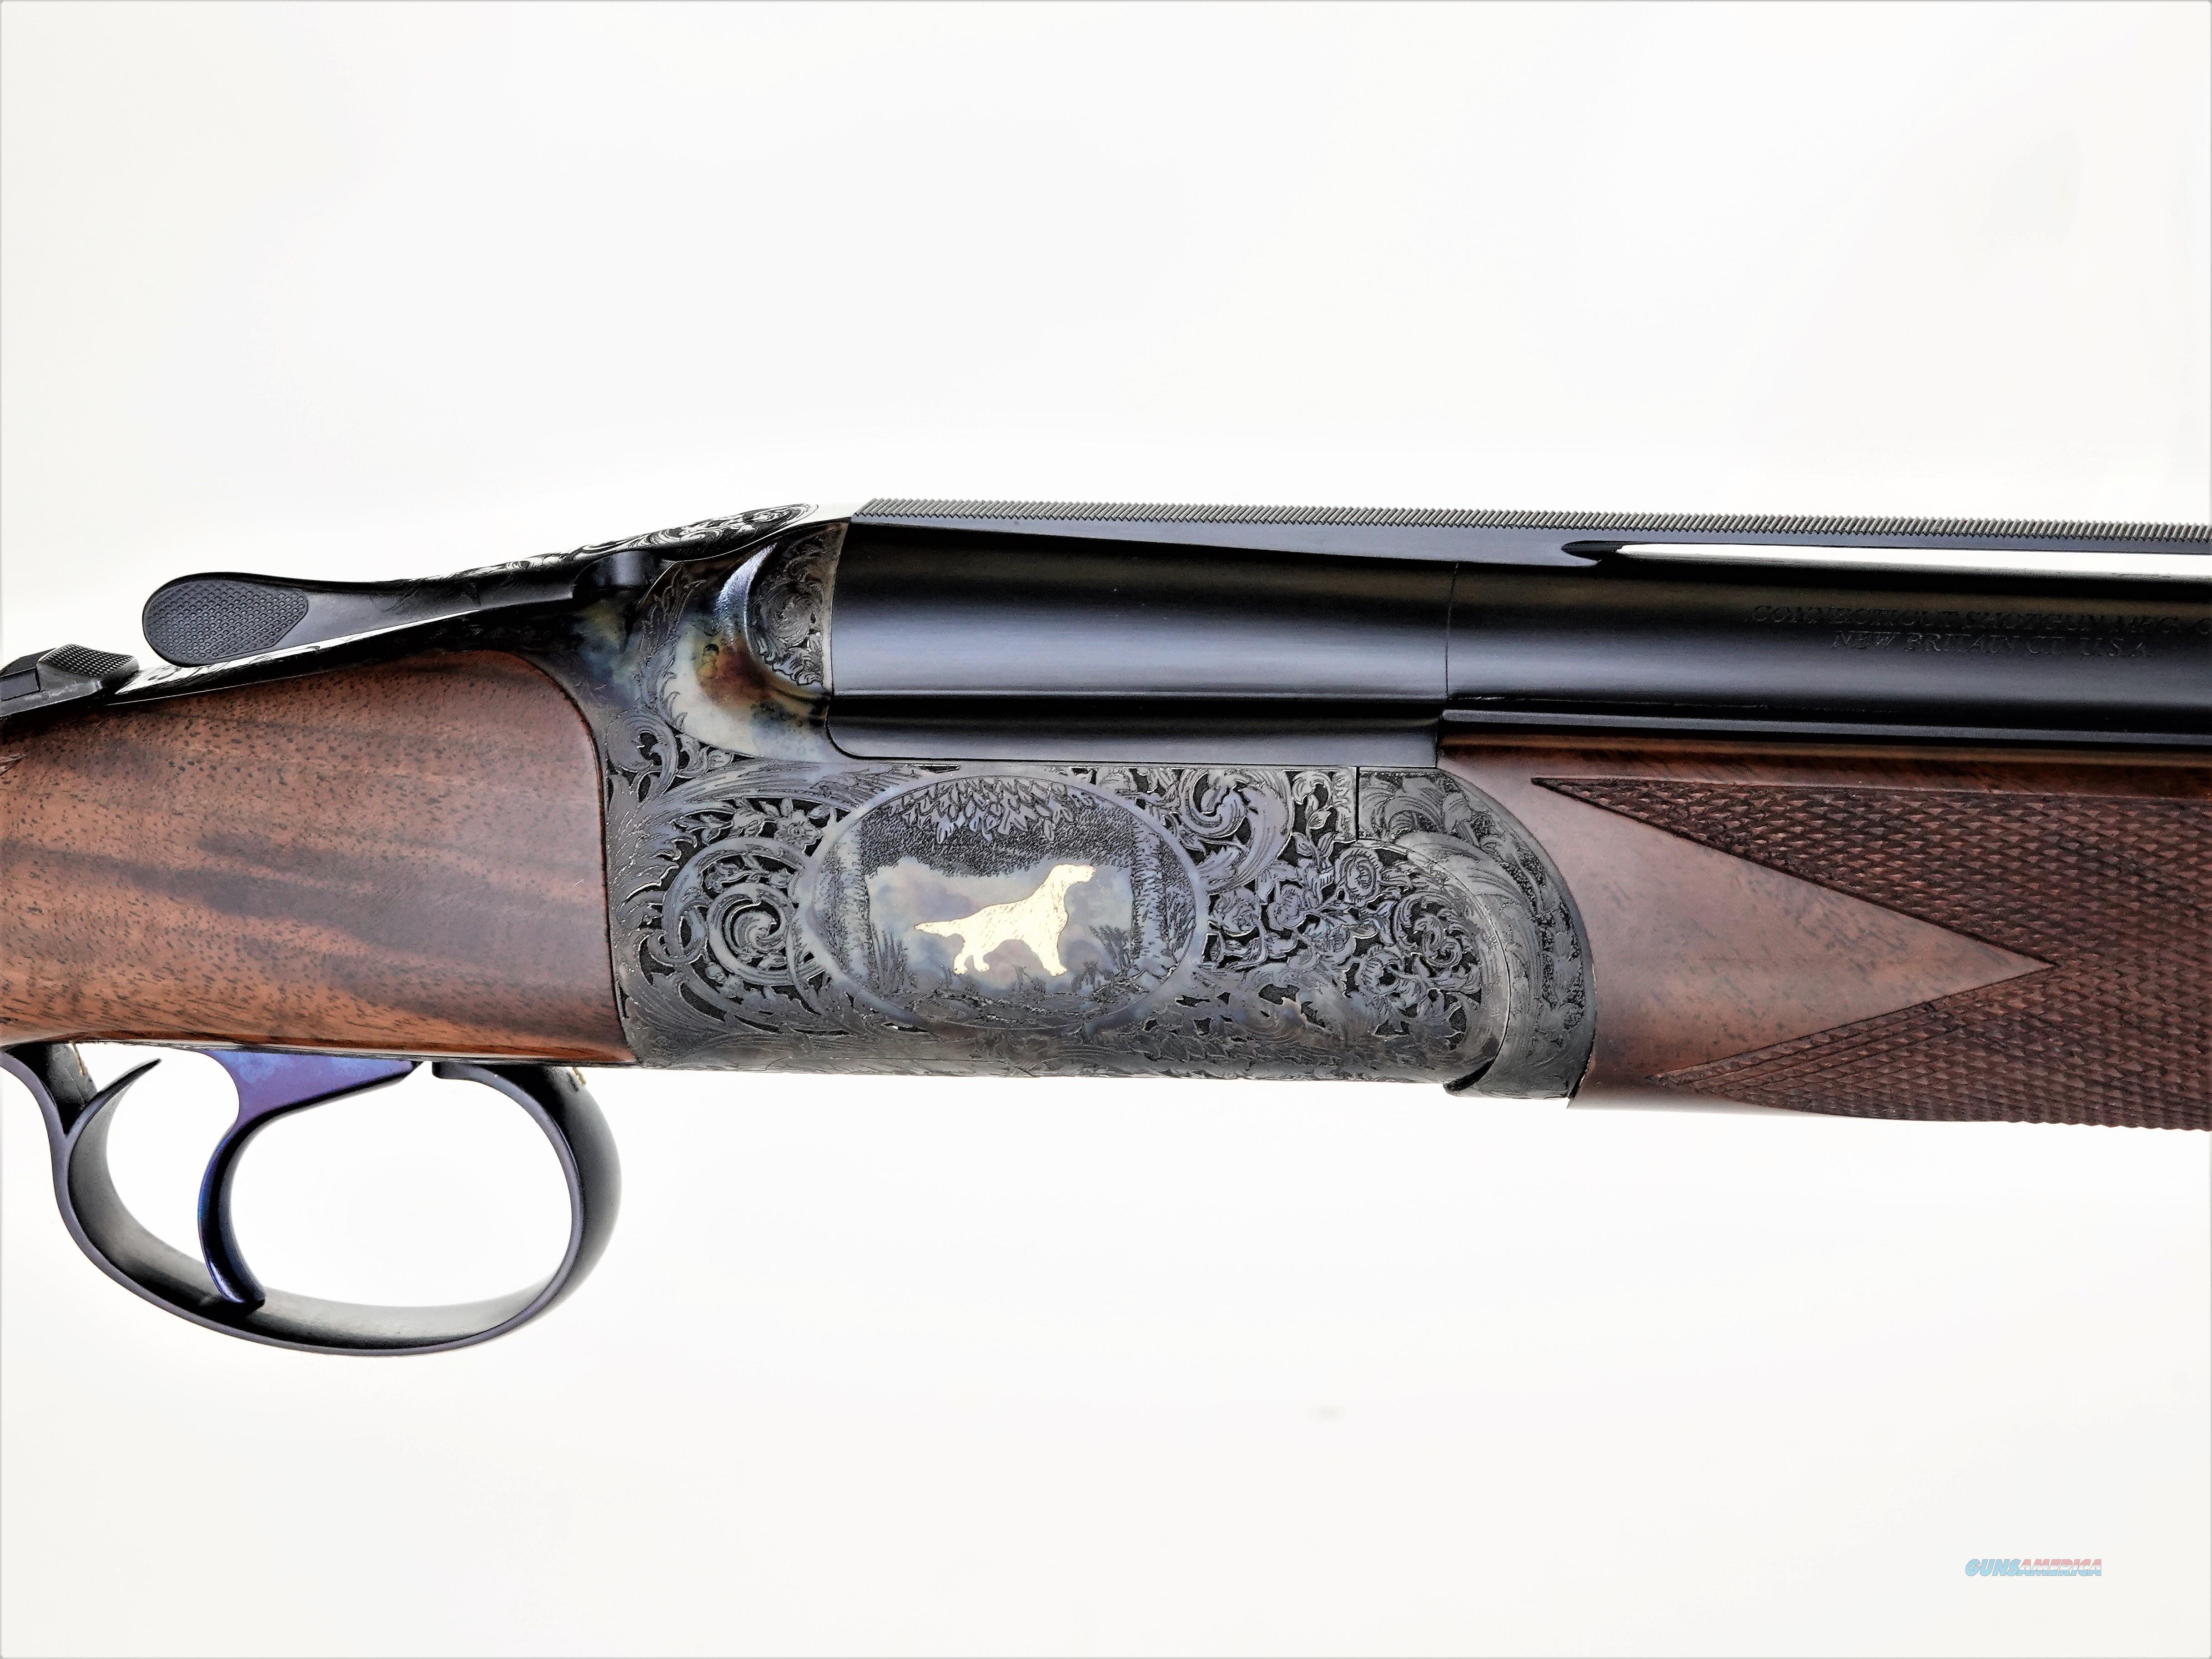 "CSMC Inverness –Round Body Deluxe, O/U, 20ga., 30"" barrels #39473  Guns > Shotguns > Connecticut (Galazan) Shotguns"